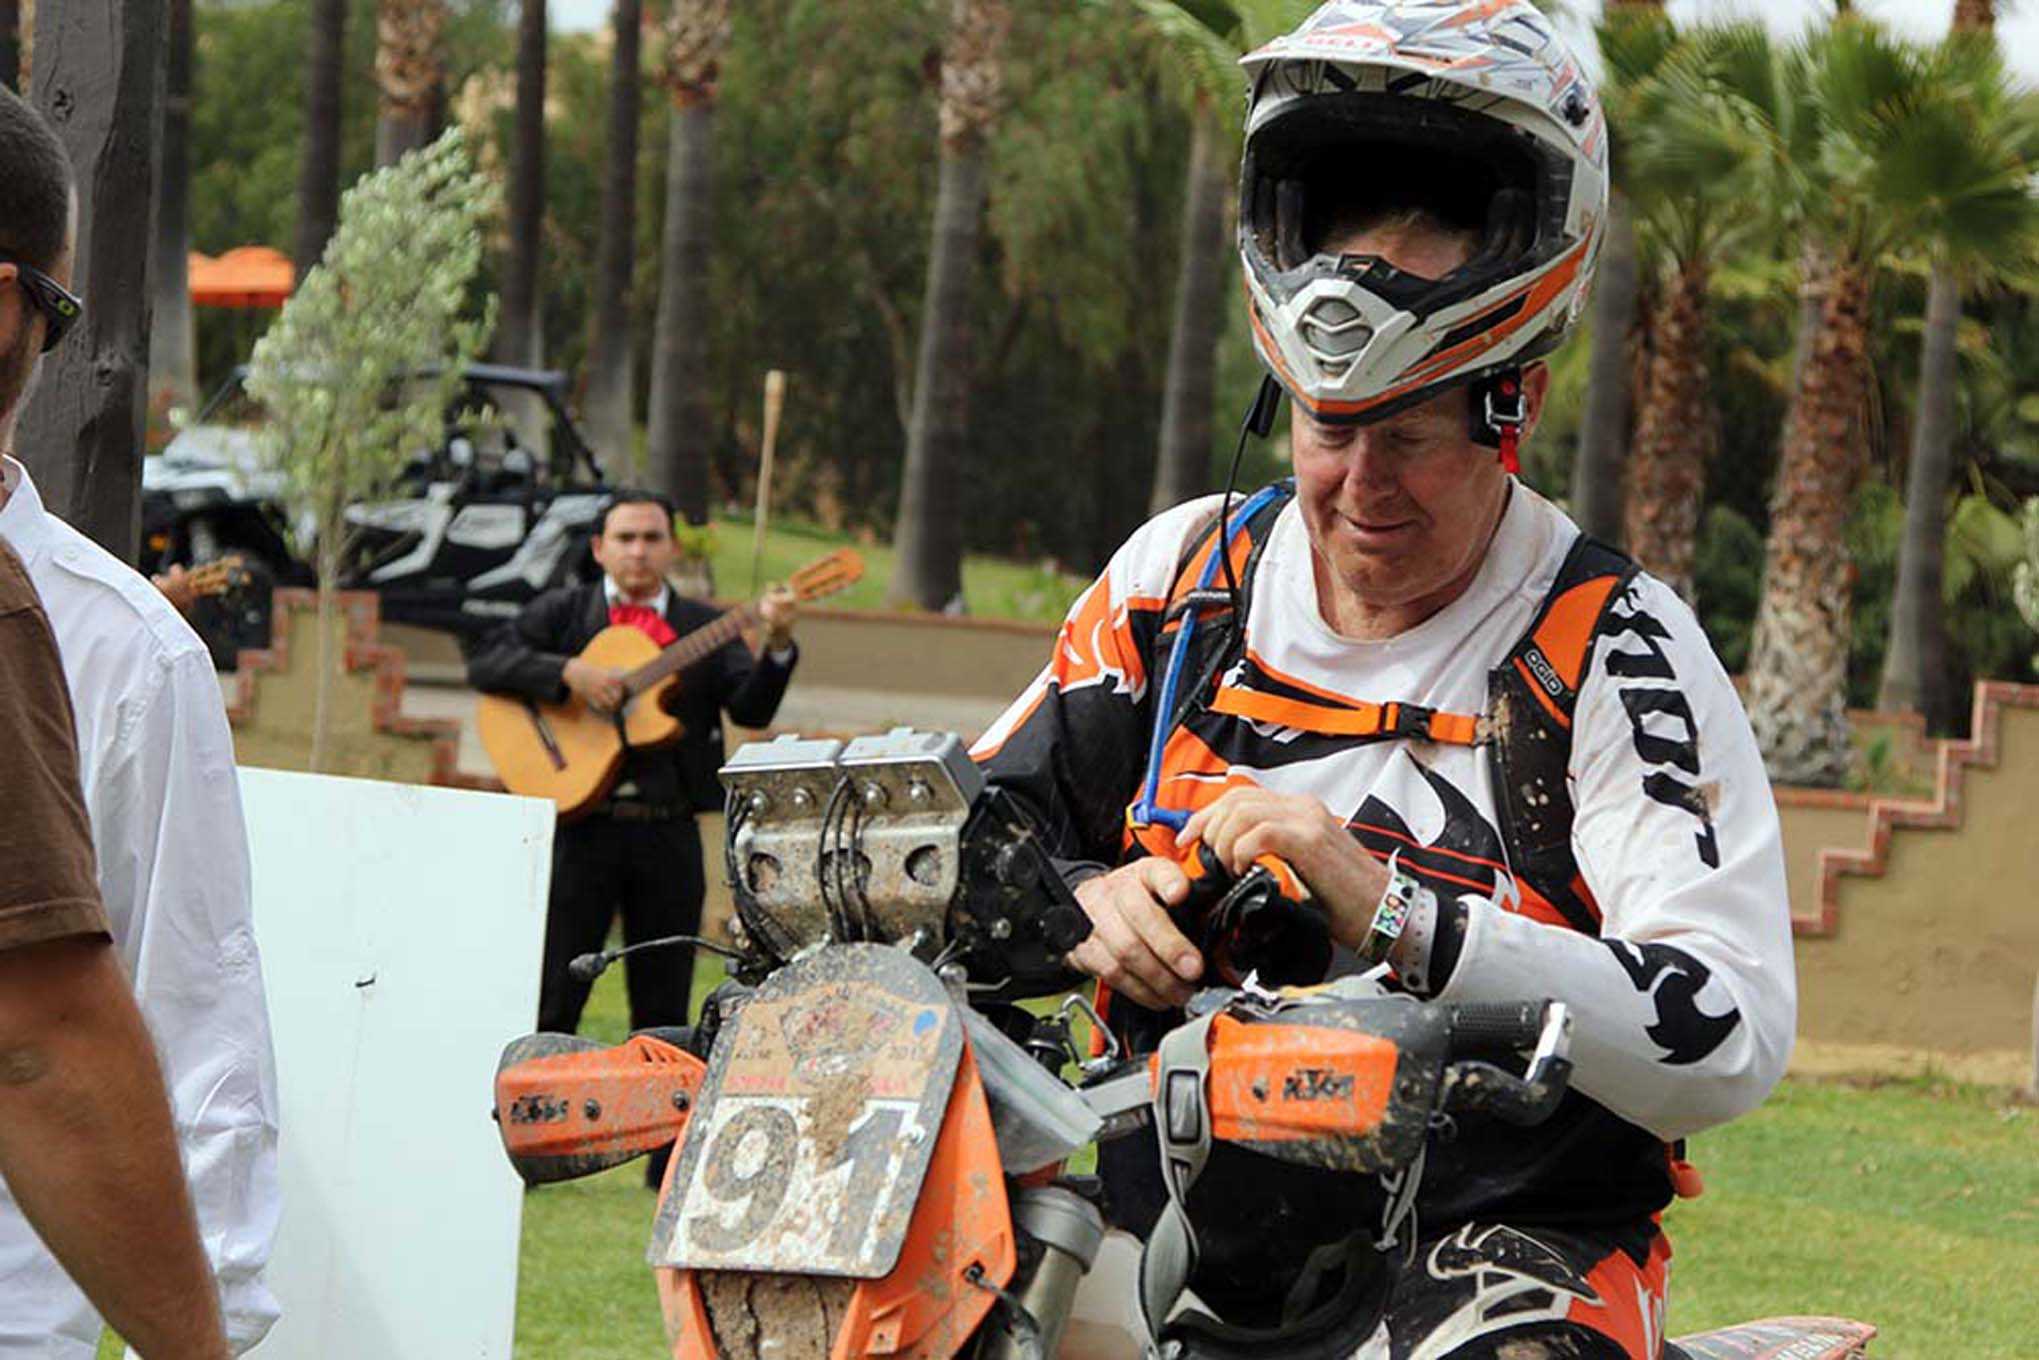 017NORRA Mexican 1000 BAJA offroad Race 2015 Manx Nova Chevy James Garner